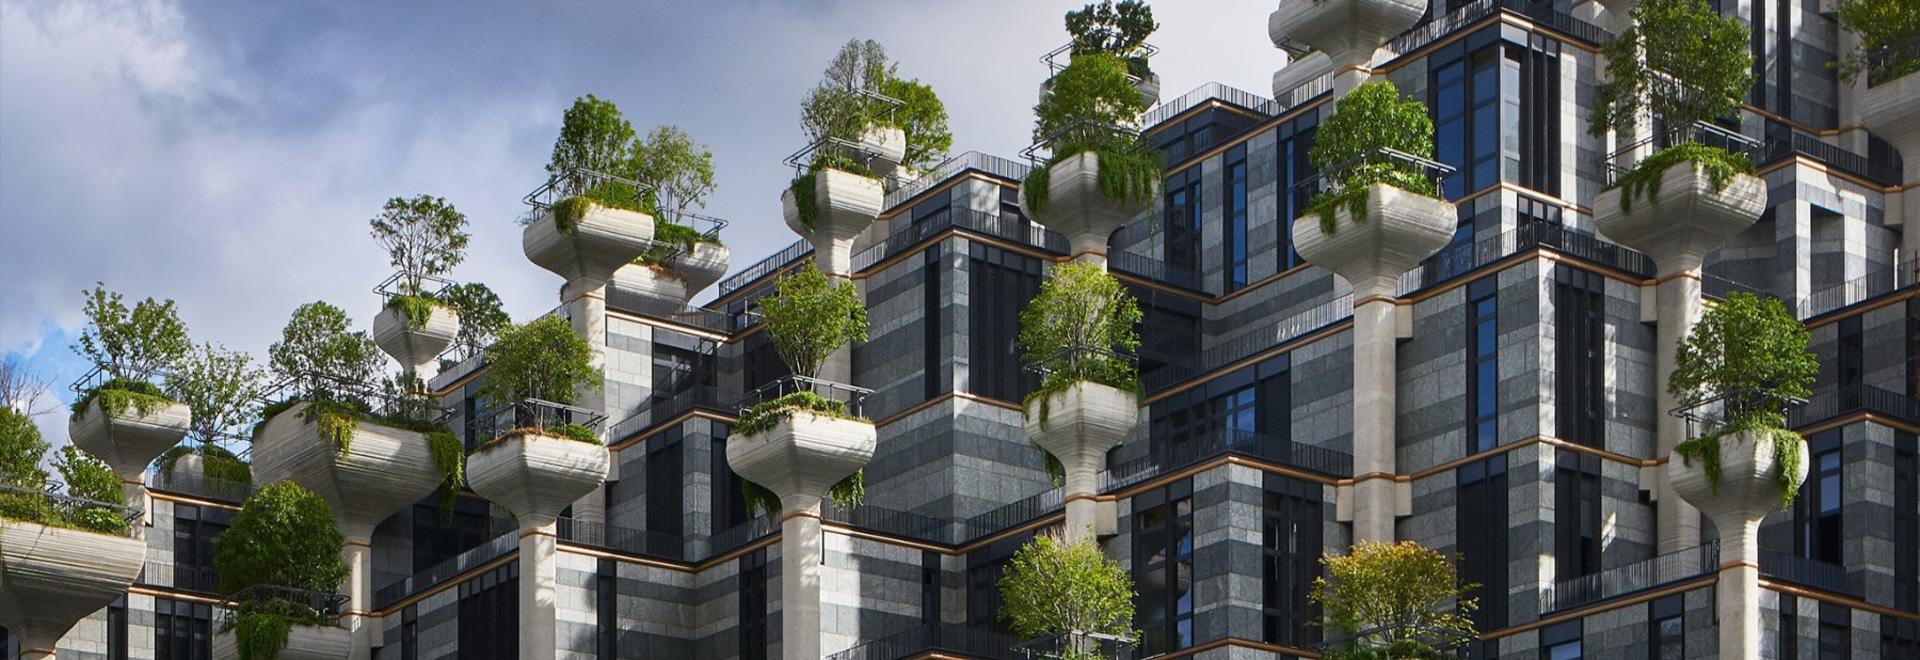 heatherwick studio's mixed-use '1000 trees' development takes shape in shanghai